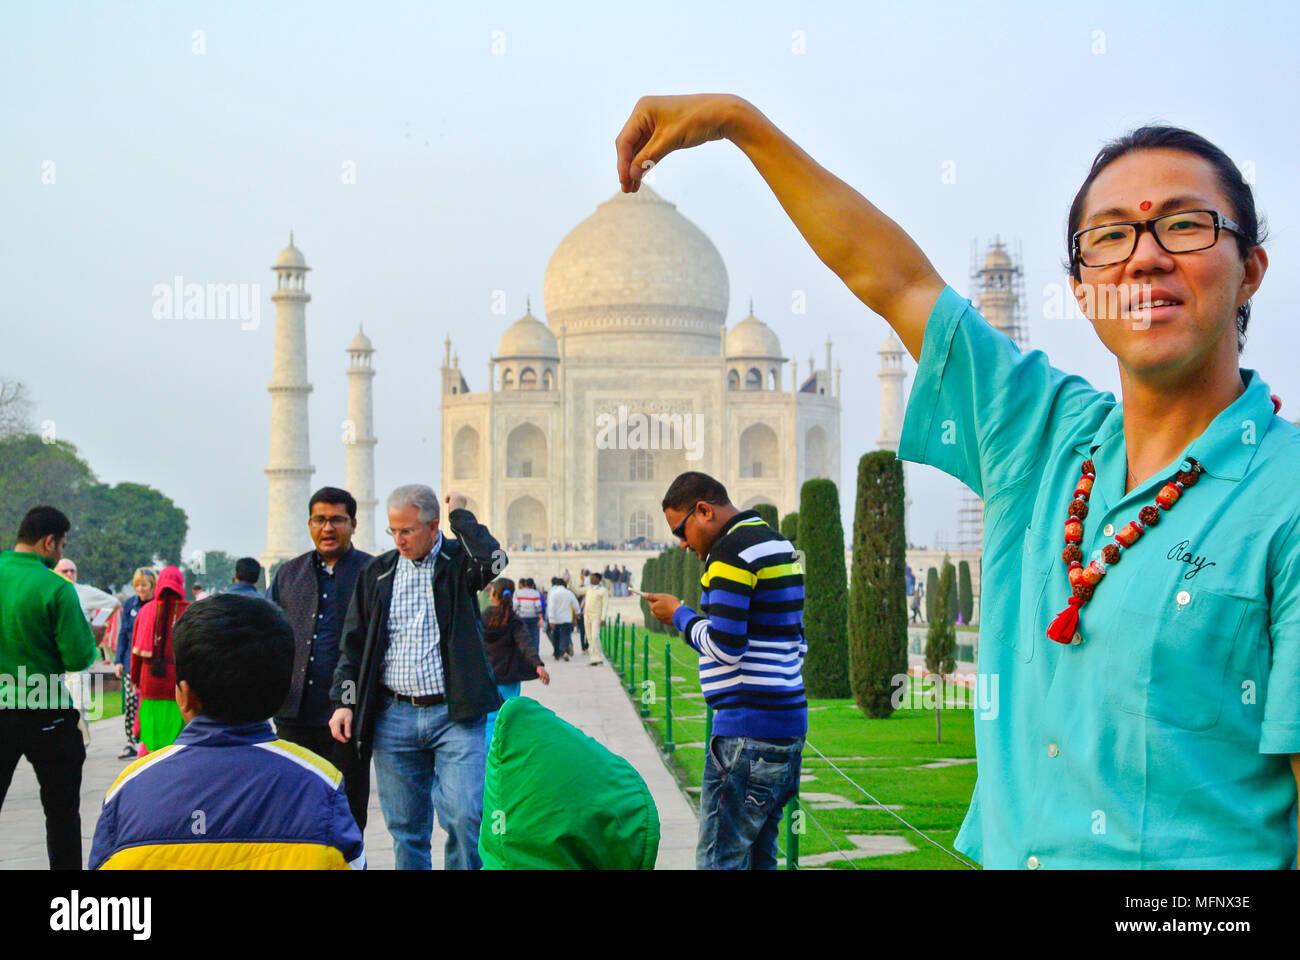 tourist at taj mahal, agra, india - Stock Image